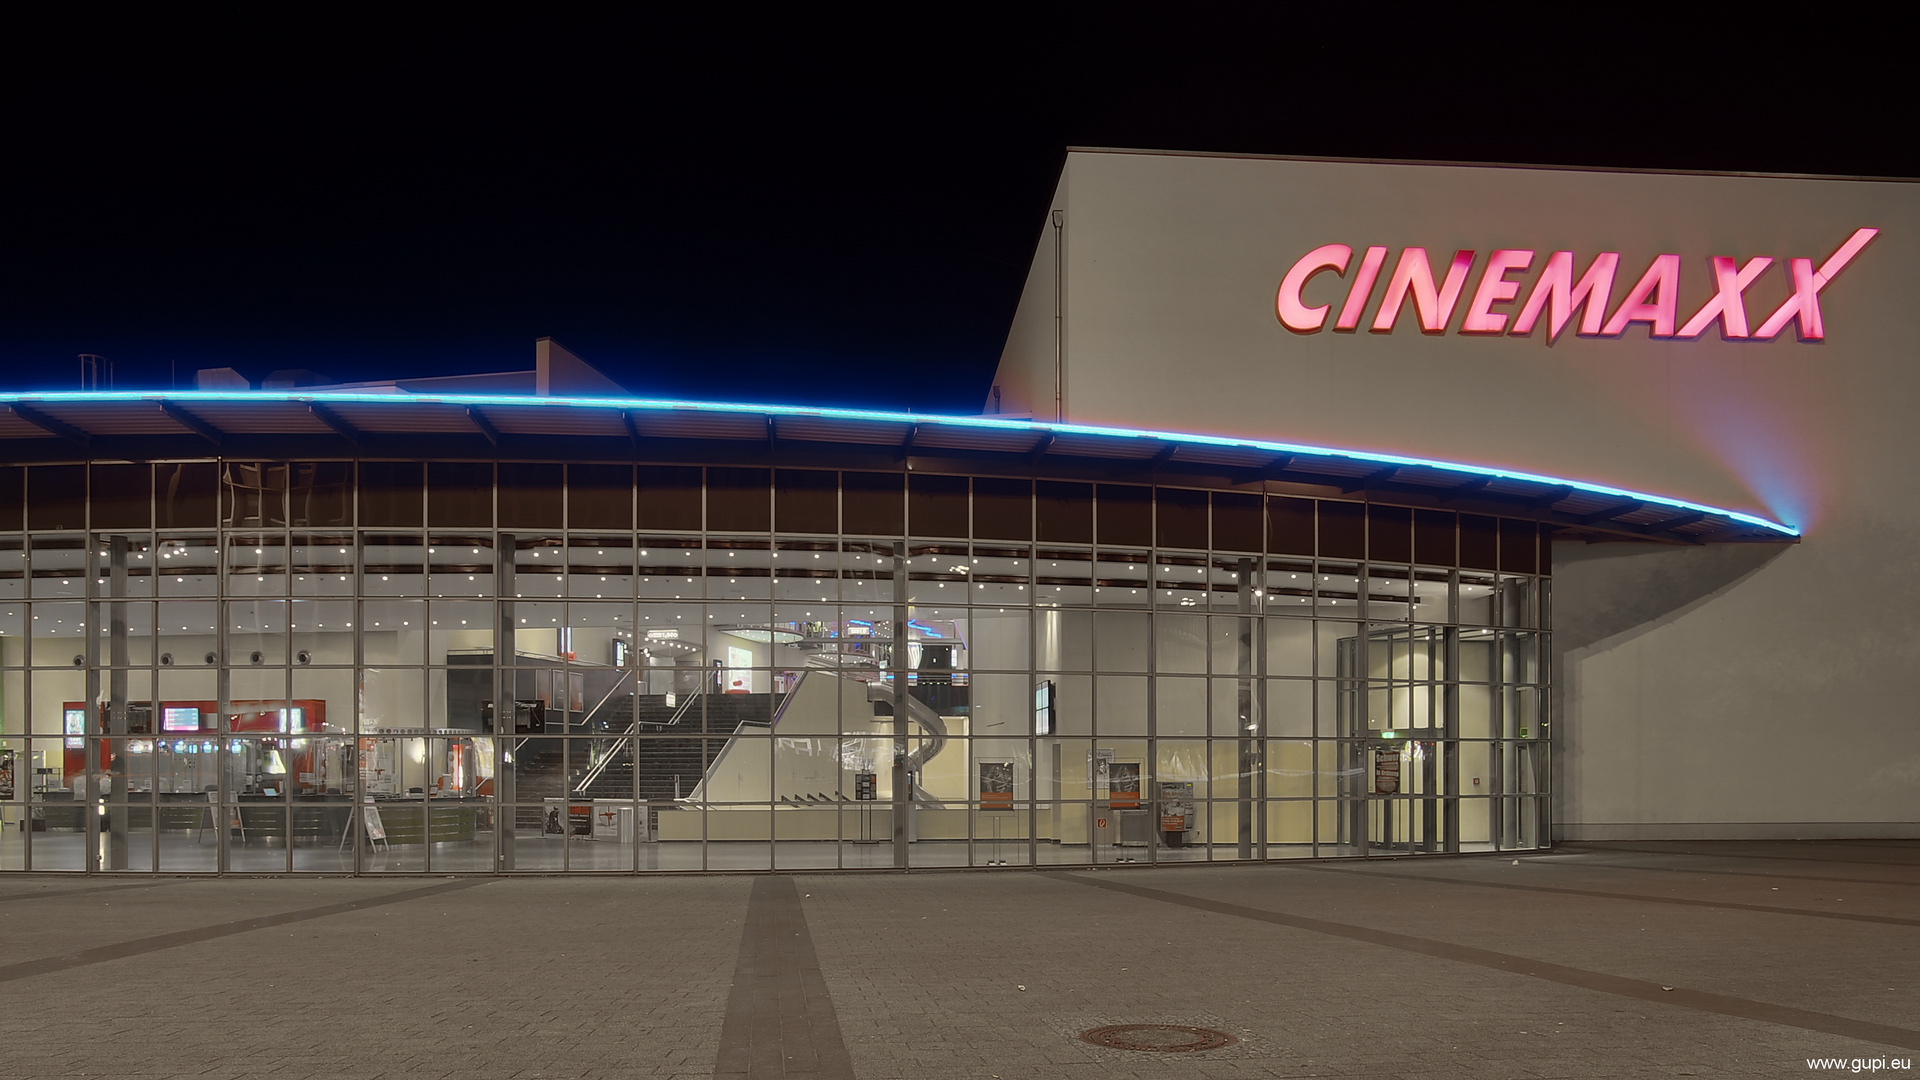 Cinemax Wuppertal